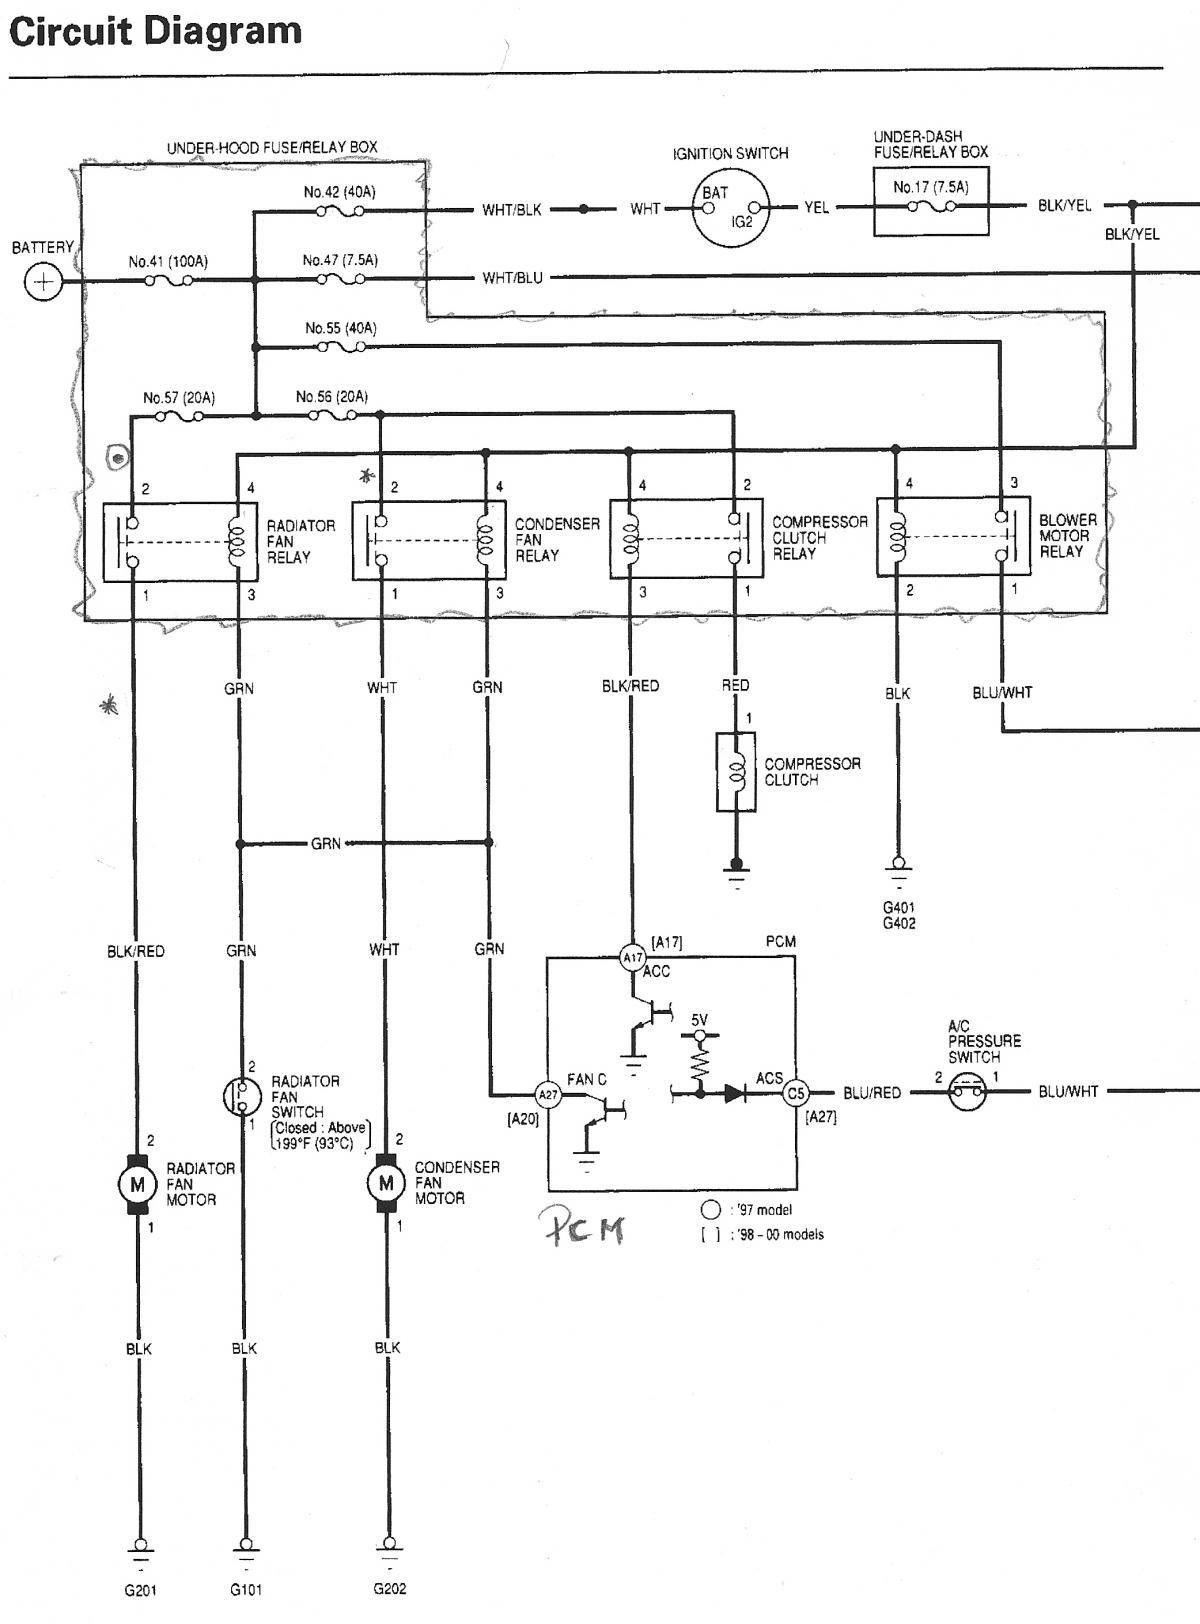 2003 Honda Crv Wiring Diagram Honda Crv Honda Accord Diagram